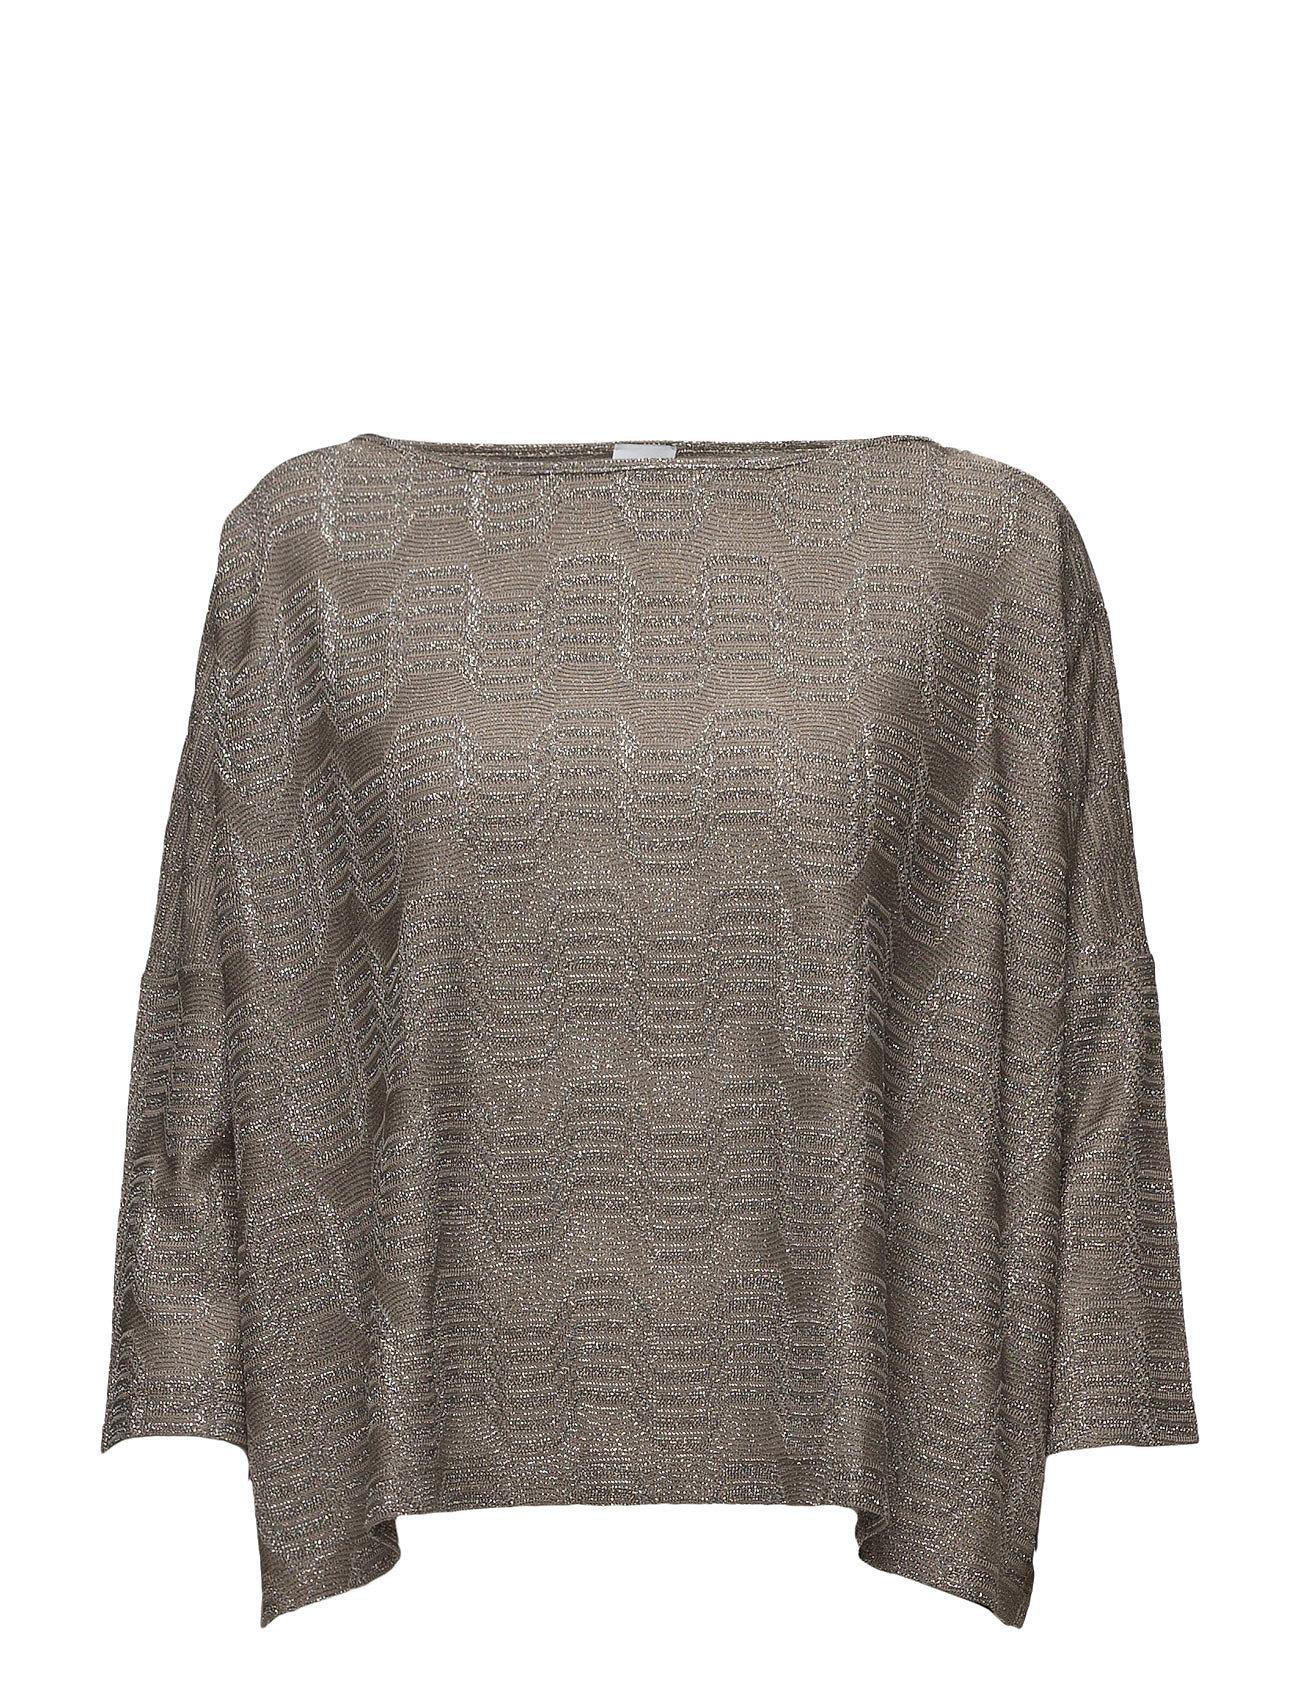 m missoni – M missoni-t-shirt fra boozt.com dk